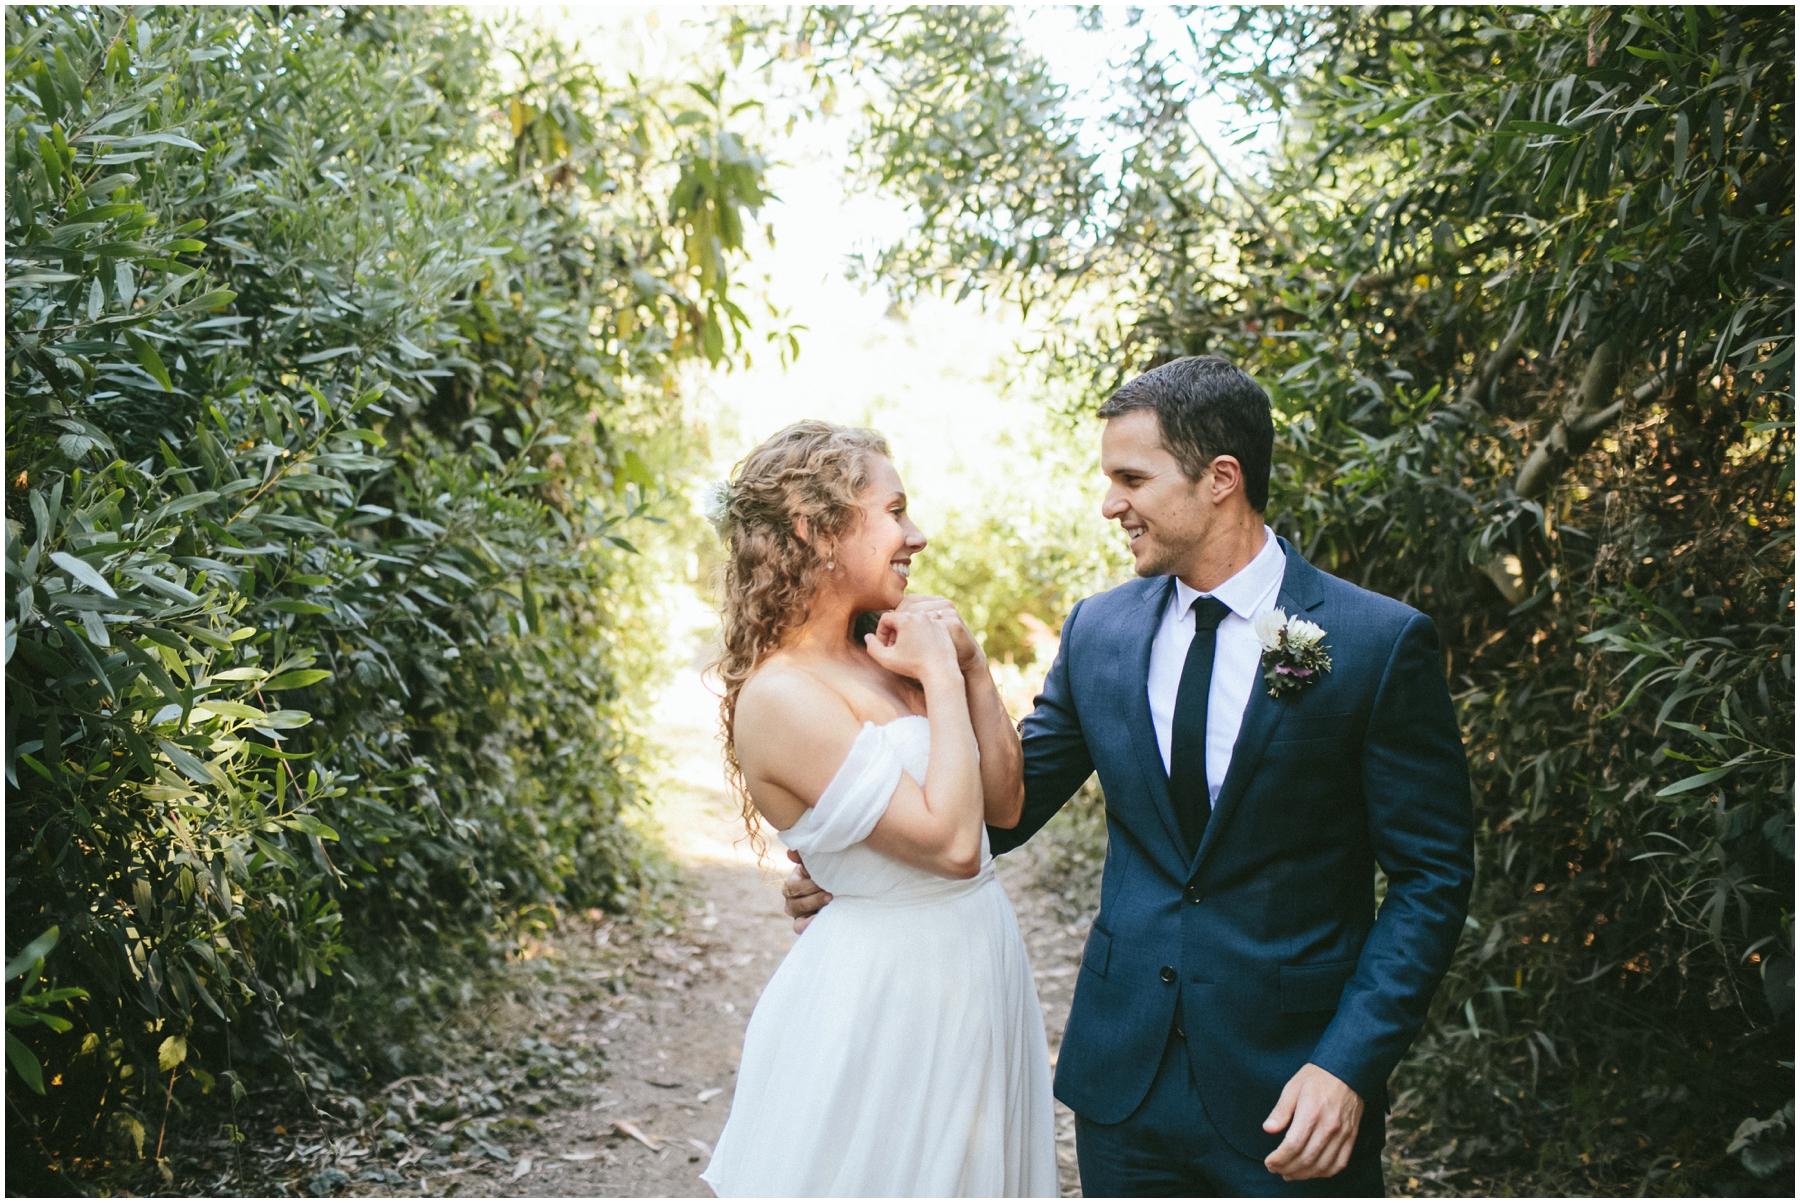 Emily+Paul-WEDDING_KellyBoitanoPhotography_0028